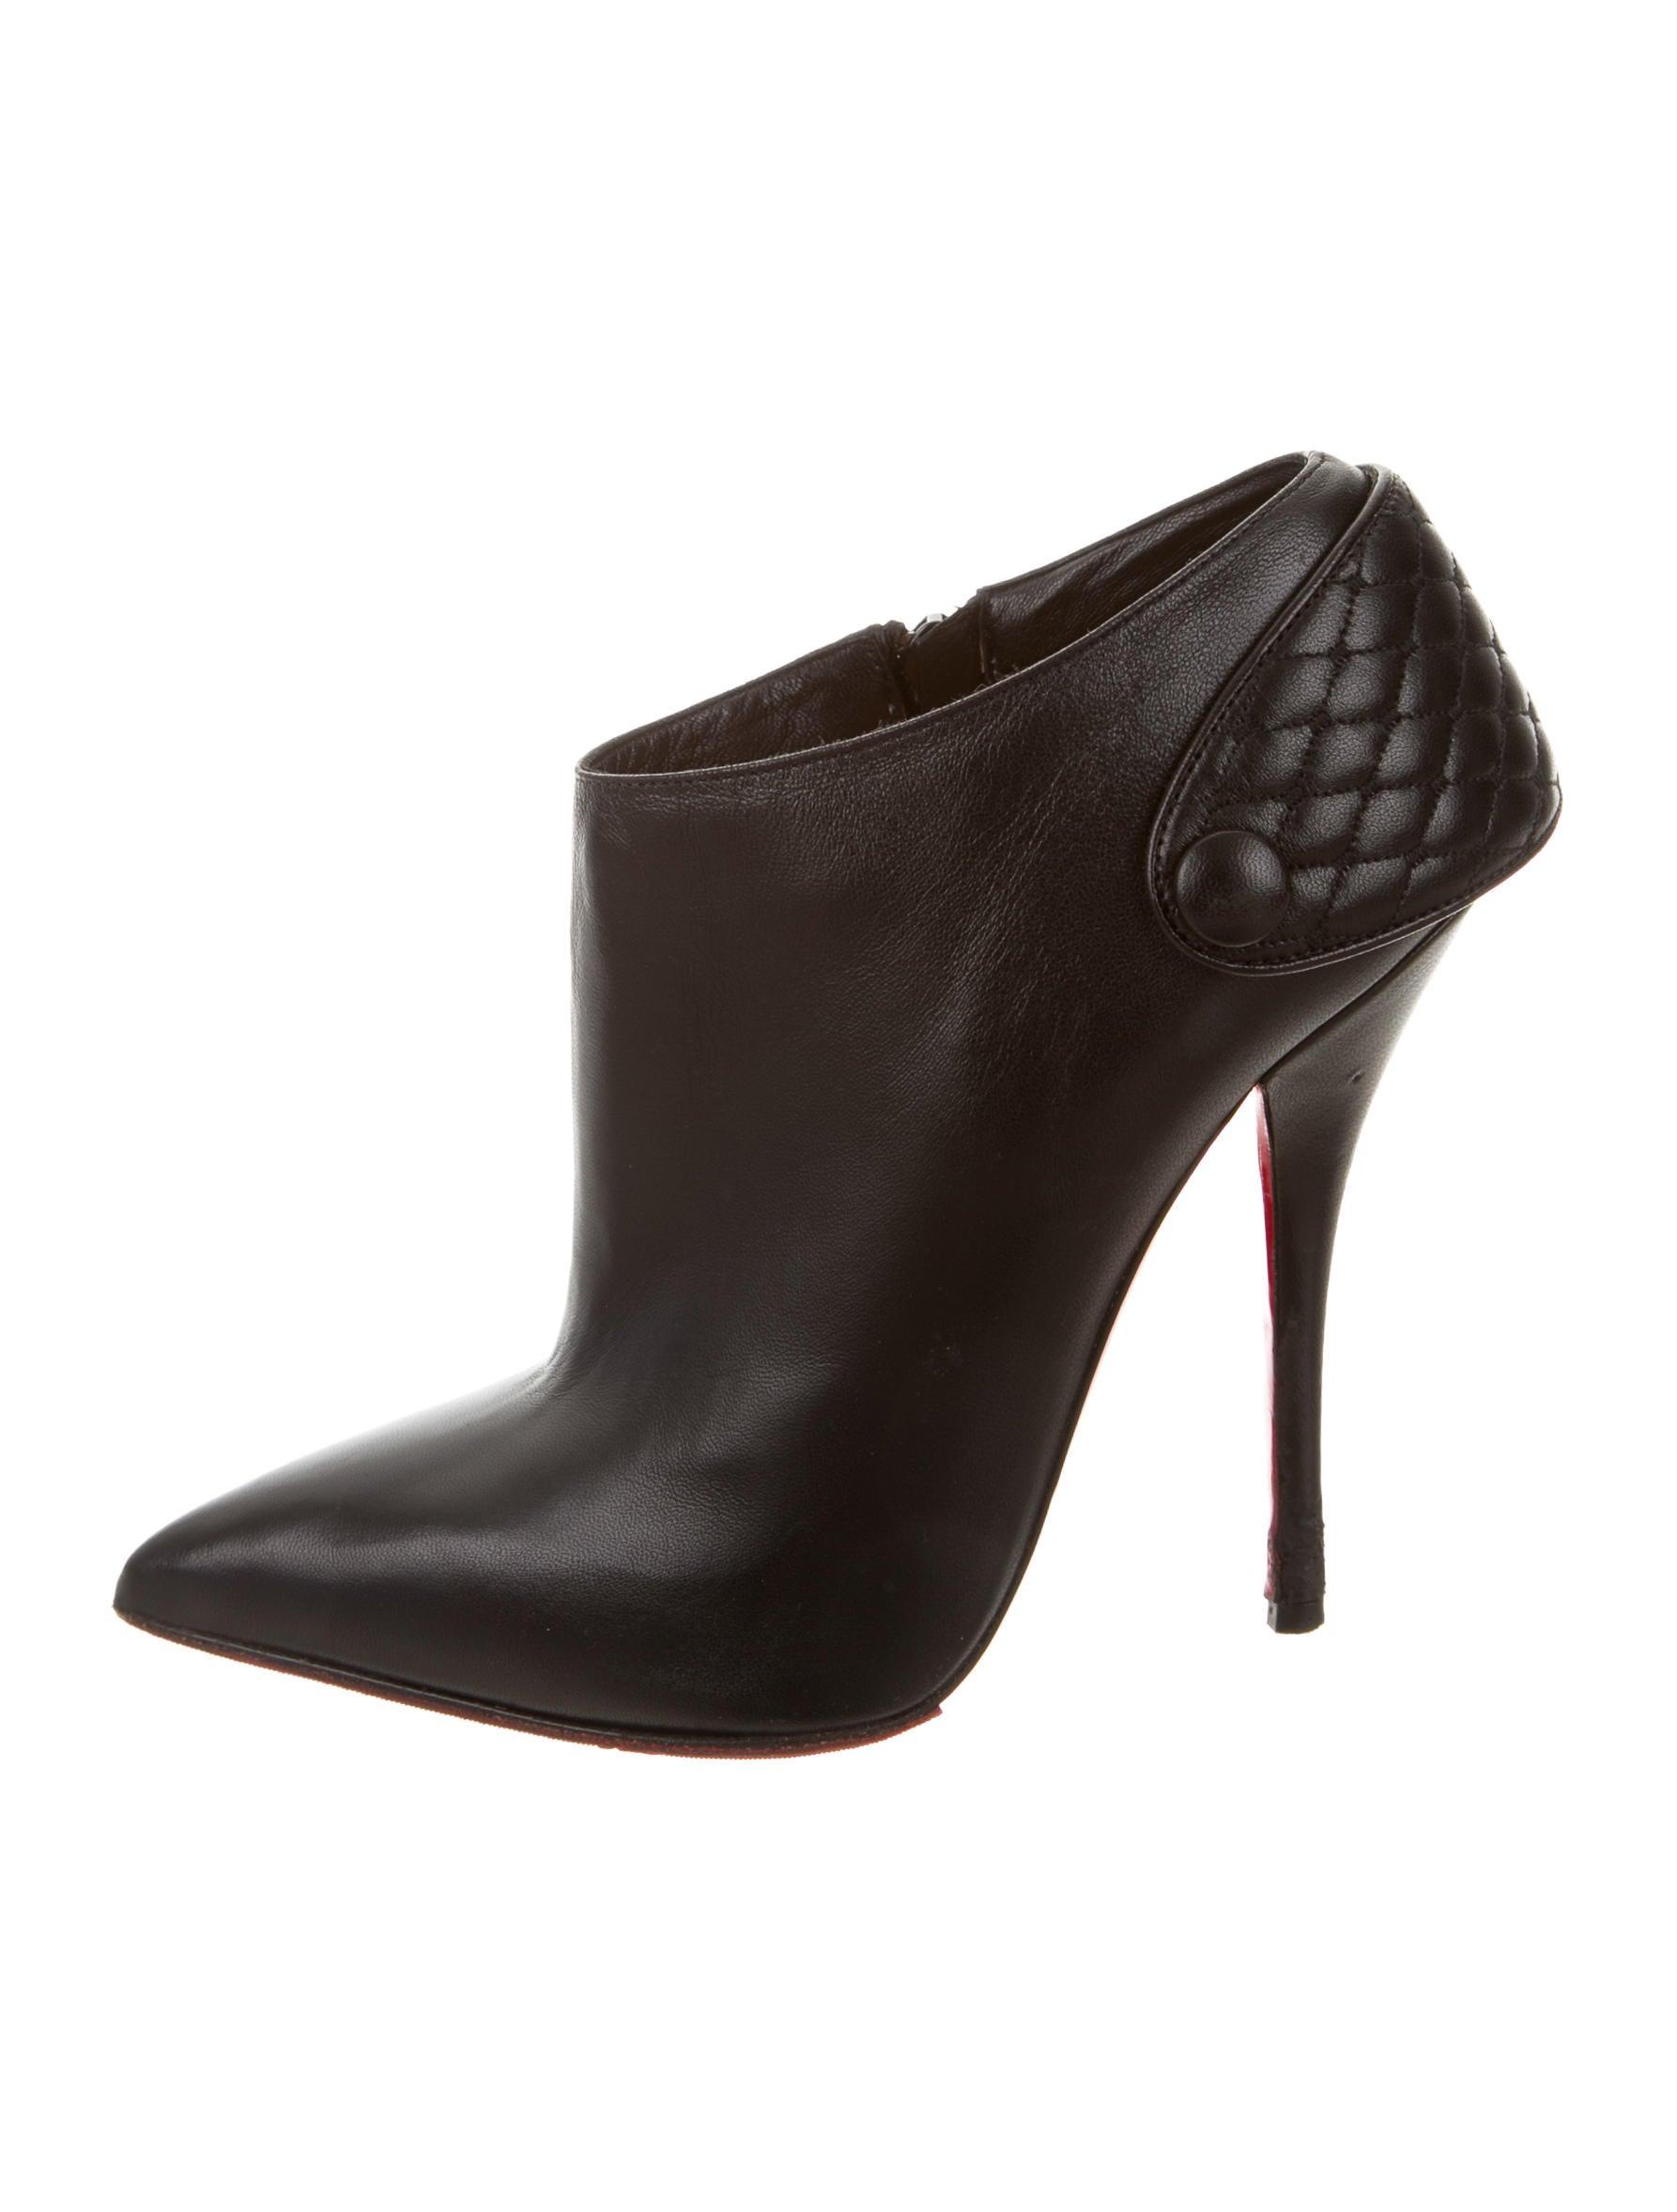 a61d3ff9ca89 ... greece women shoes christian louboutin quilted leather booties. quilted leather  booties db798 97ca6